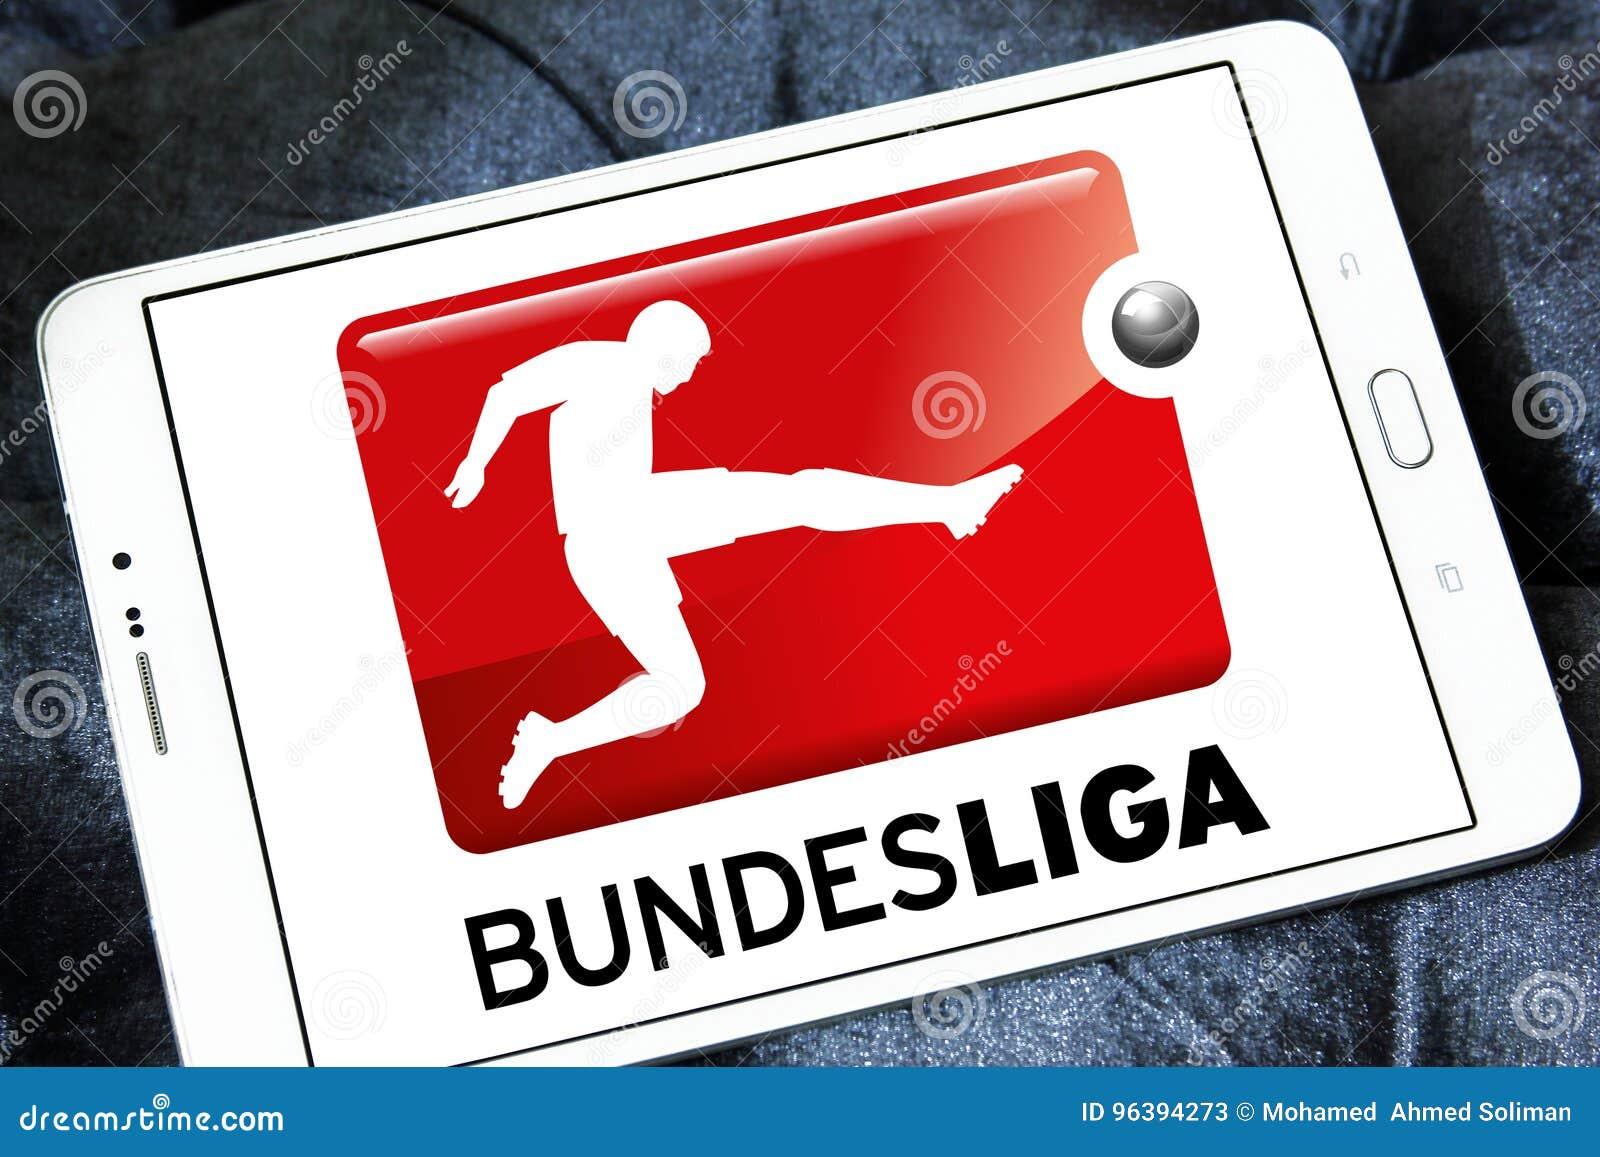 10+ Bundesliga Logo Jpg